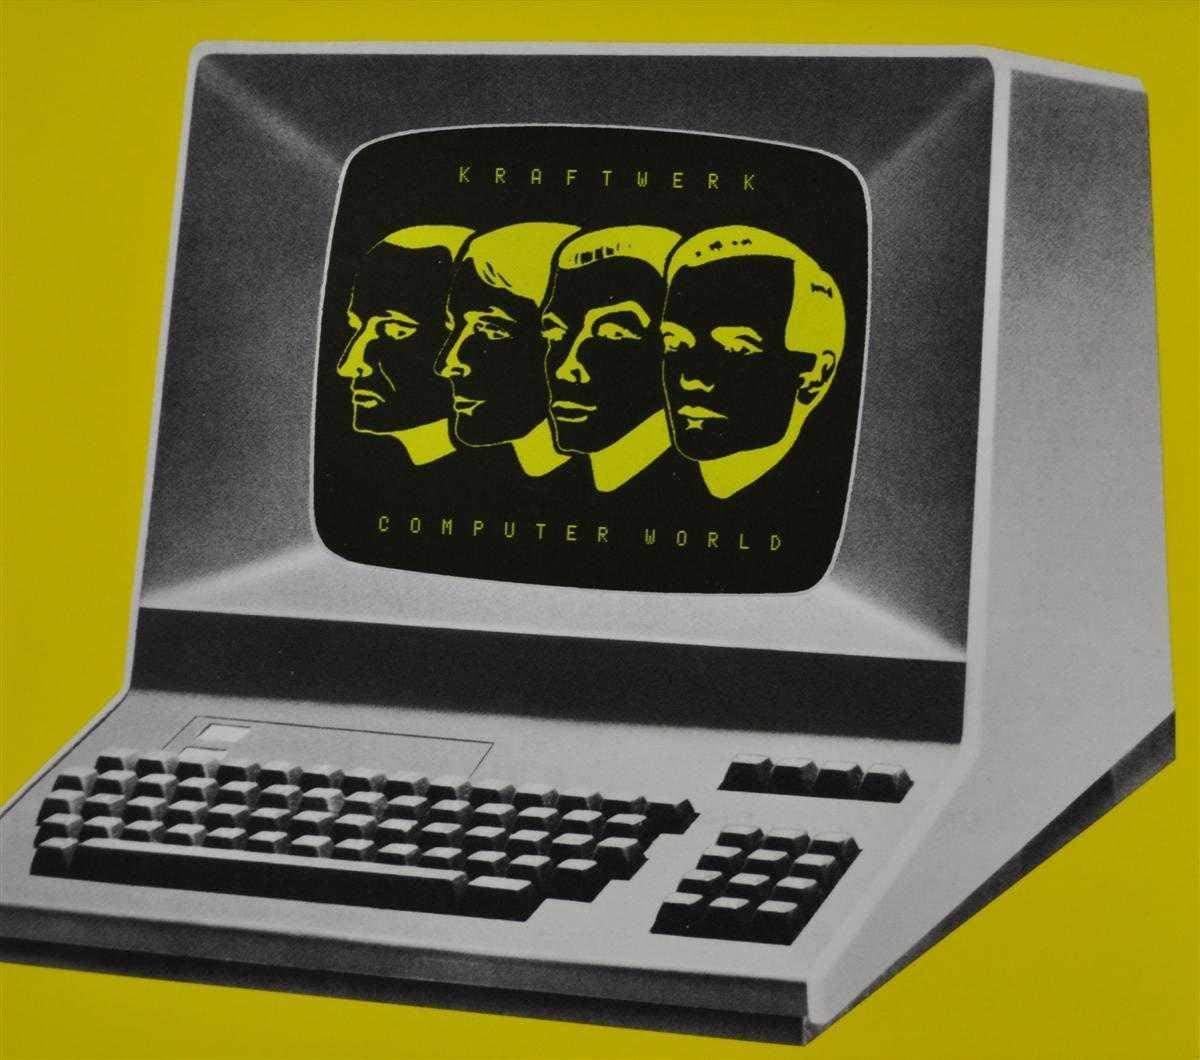 Kraftwerk - capa do álbum Computer World